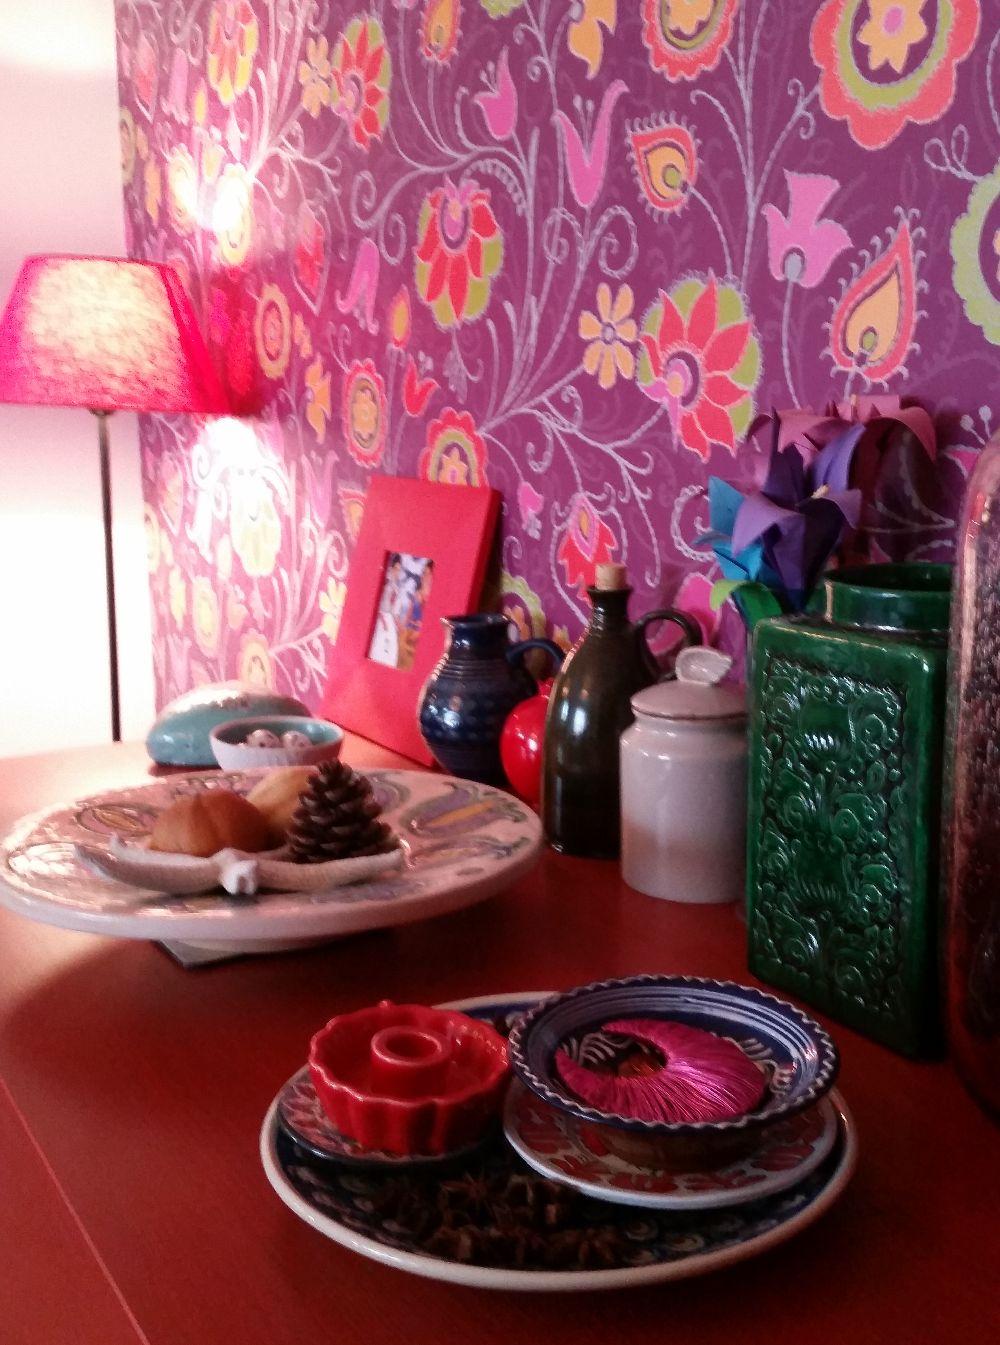 adelaparvu.com despre apartament 3 camere colorat in Sibiu, Foto Adela Parvu (12)